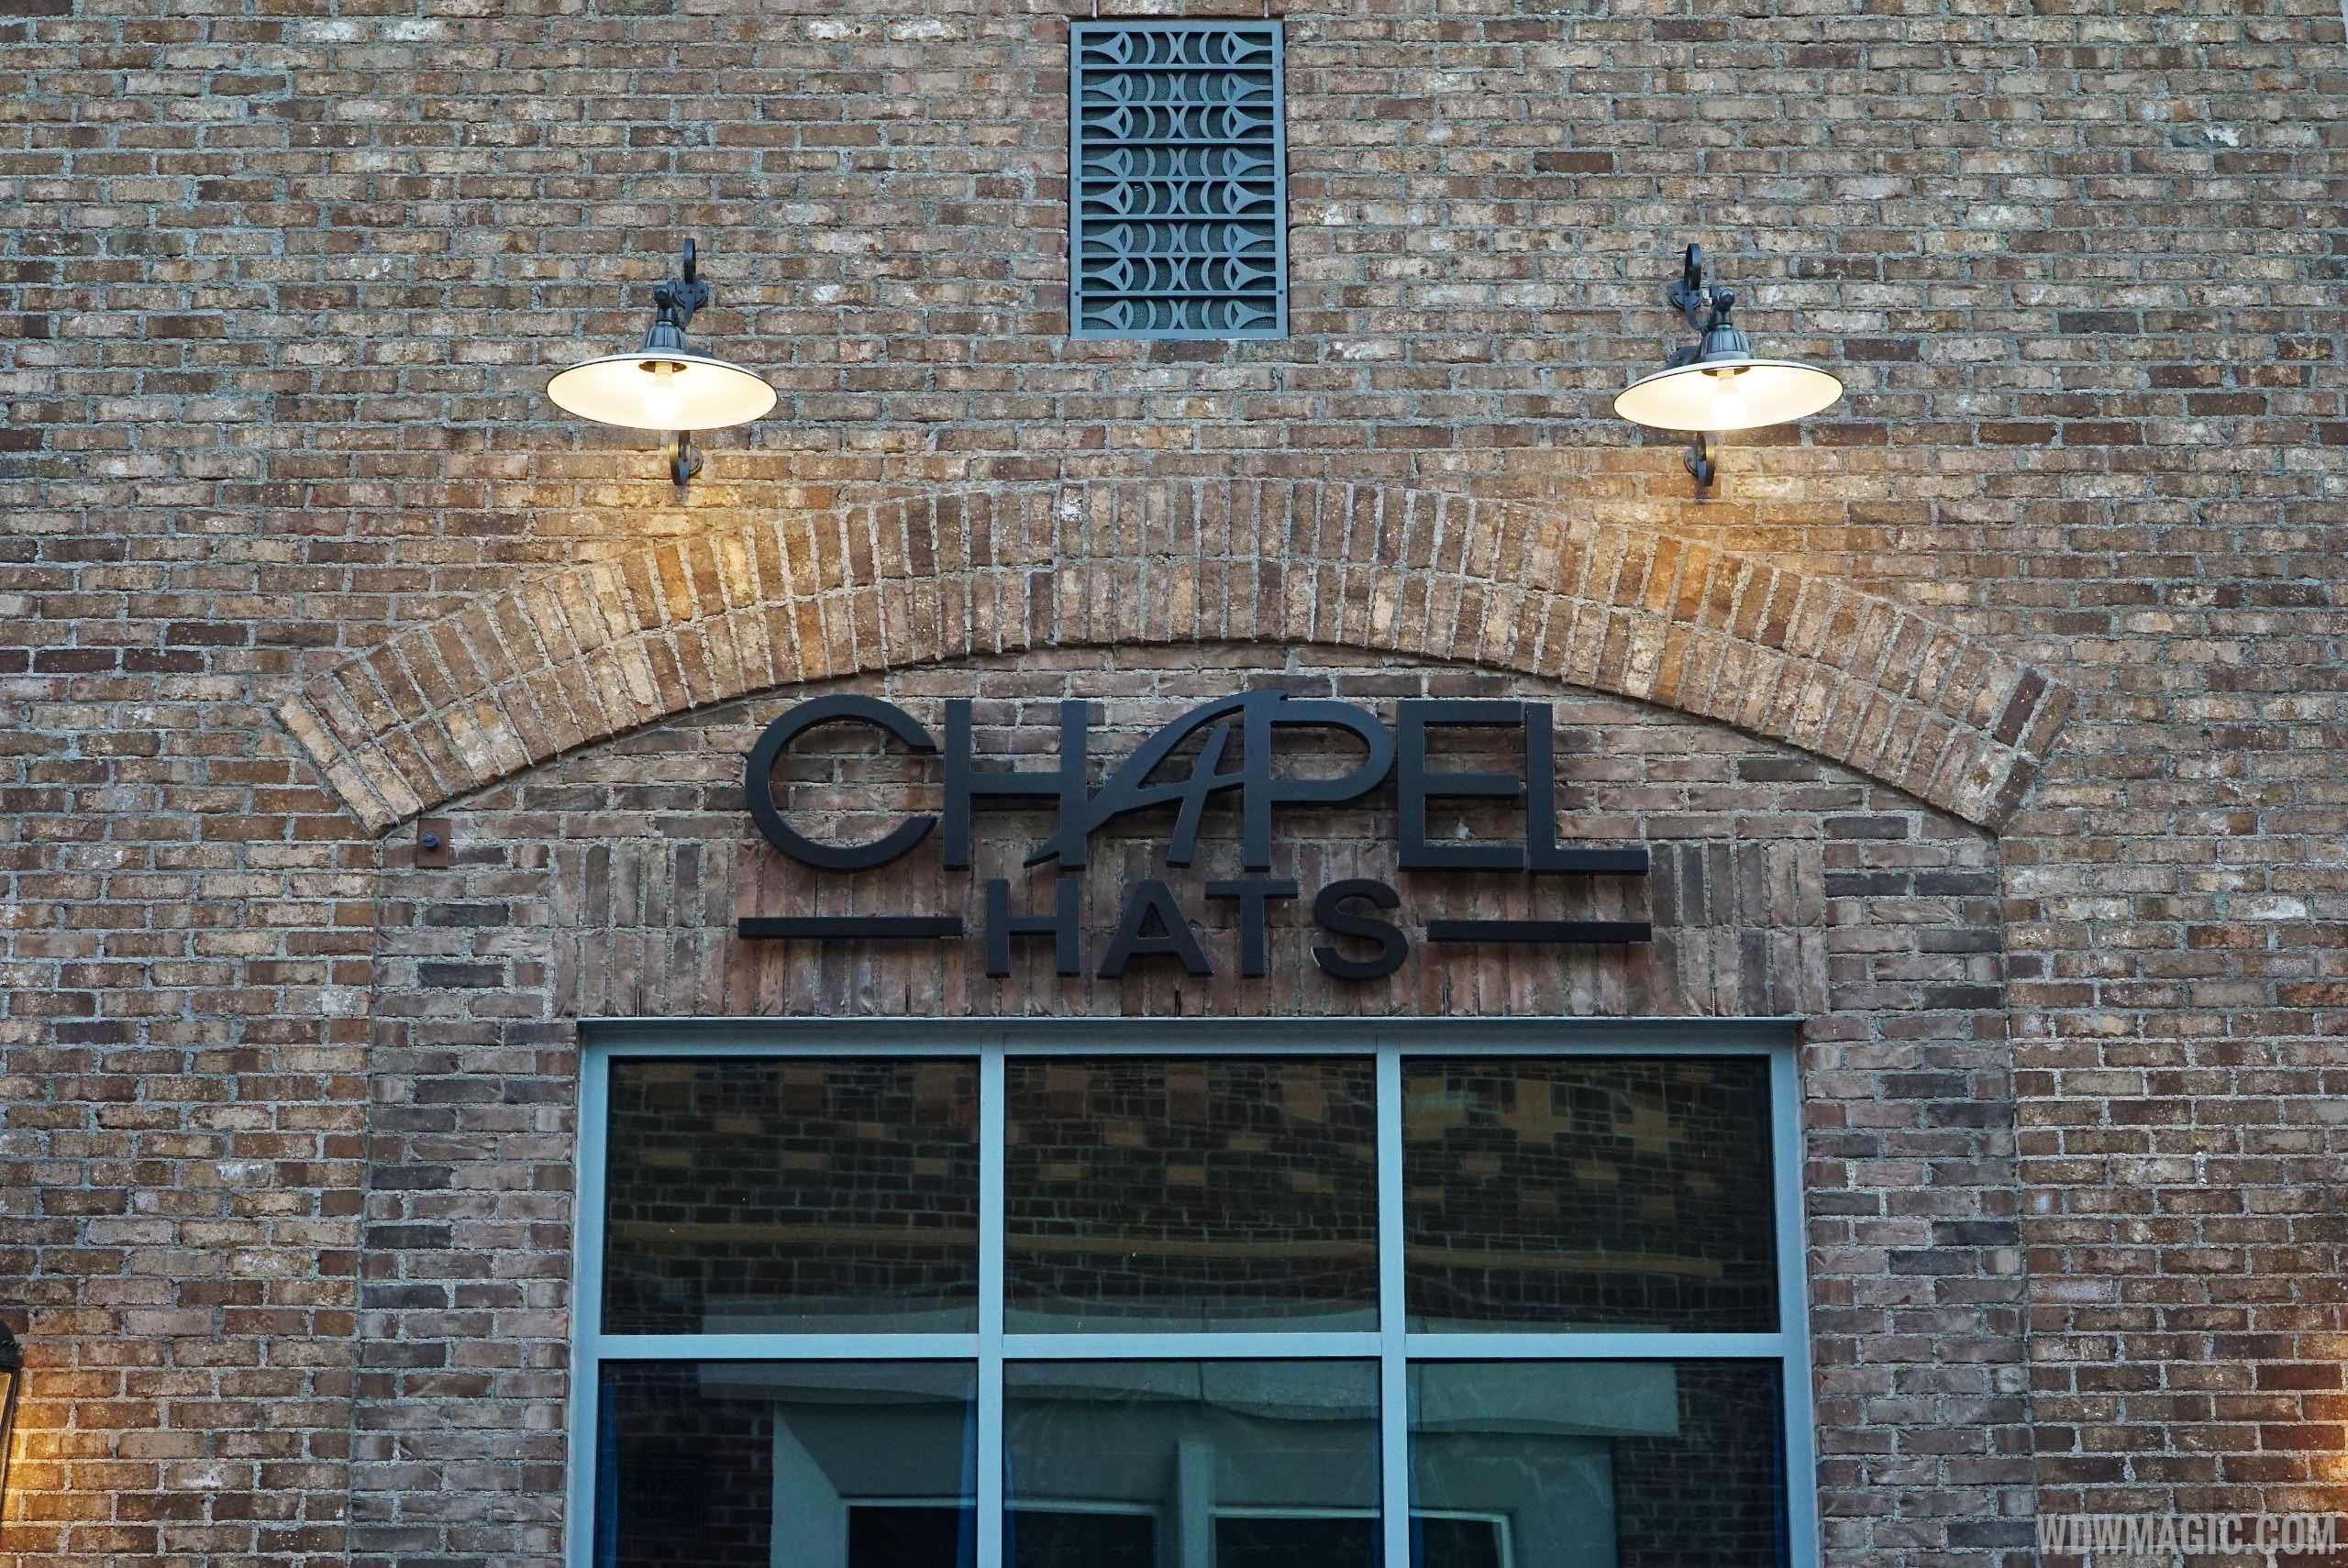 Chapel Hats signage